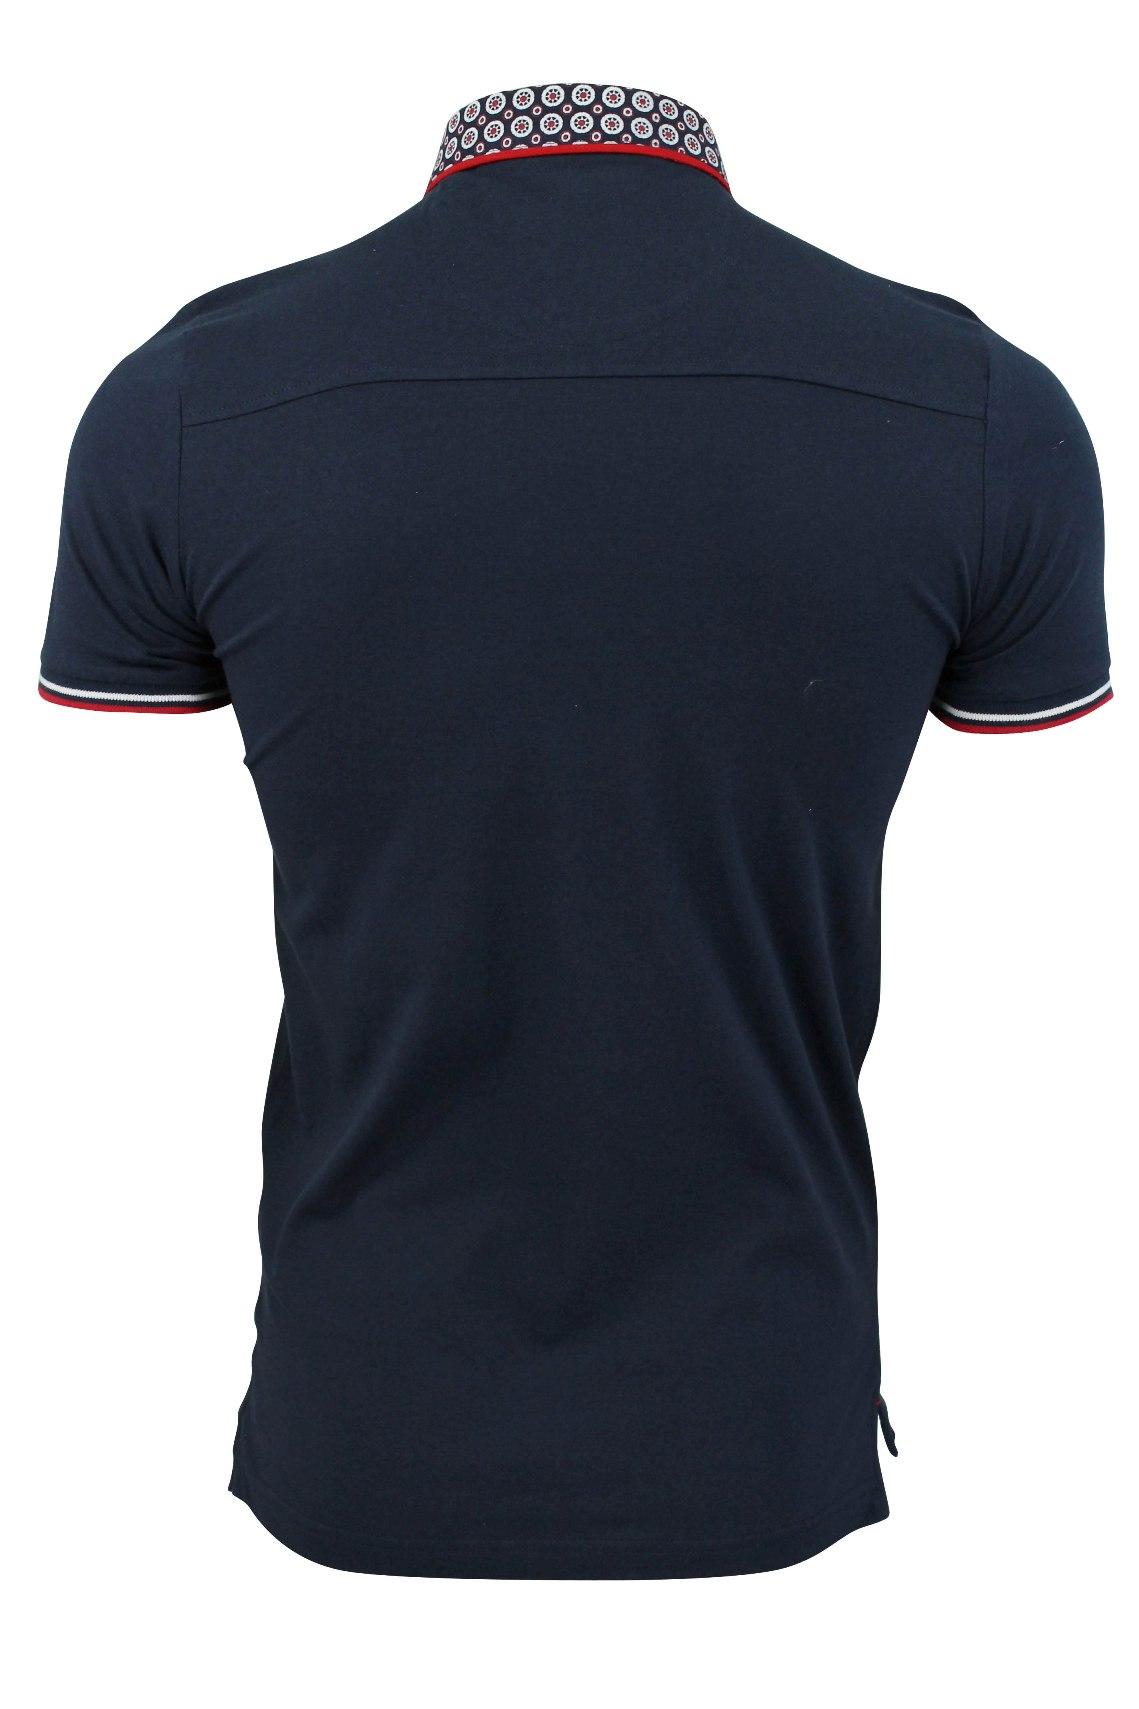 Mens-Polo-T-Shirt-Chimera-Brave-Soul-Denim-Chambray-Collar-Short-Sleeved-Cotton thumbnail 43